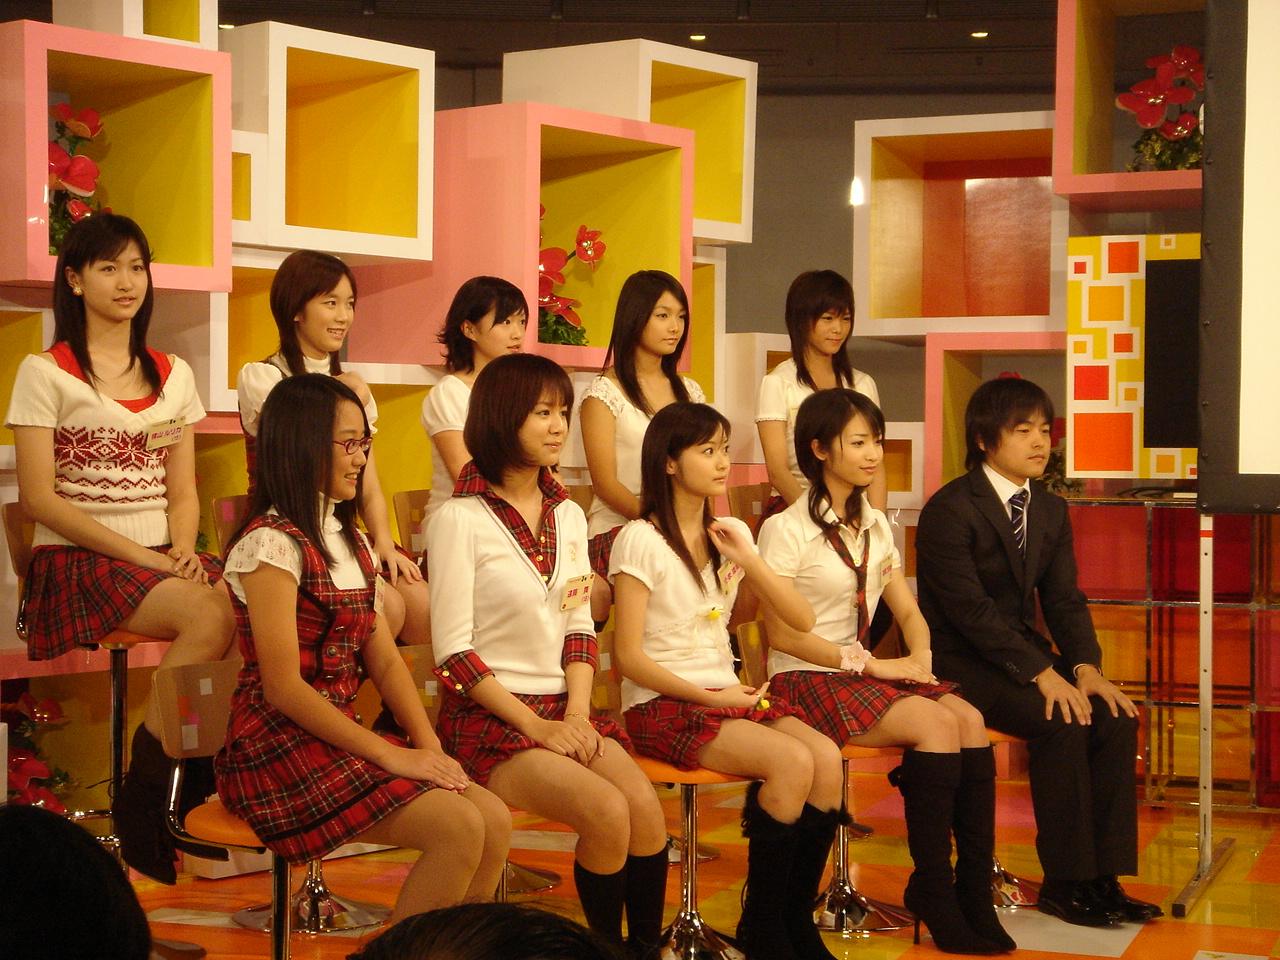 NAVER まとめ【眺め最高】アイドルグループ アイドリング [おすすめ画像集]